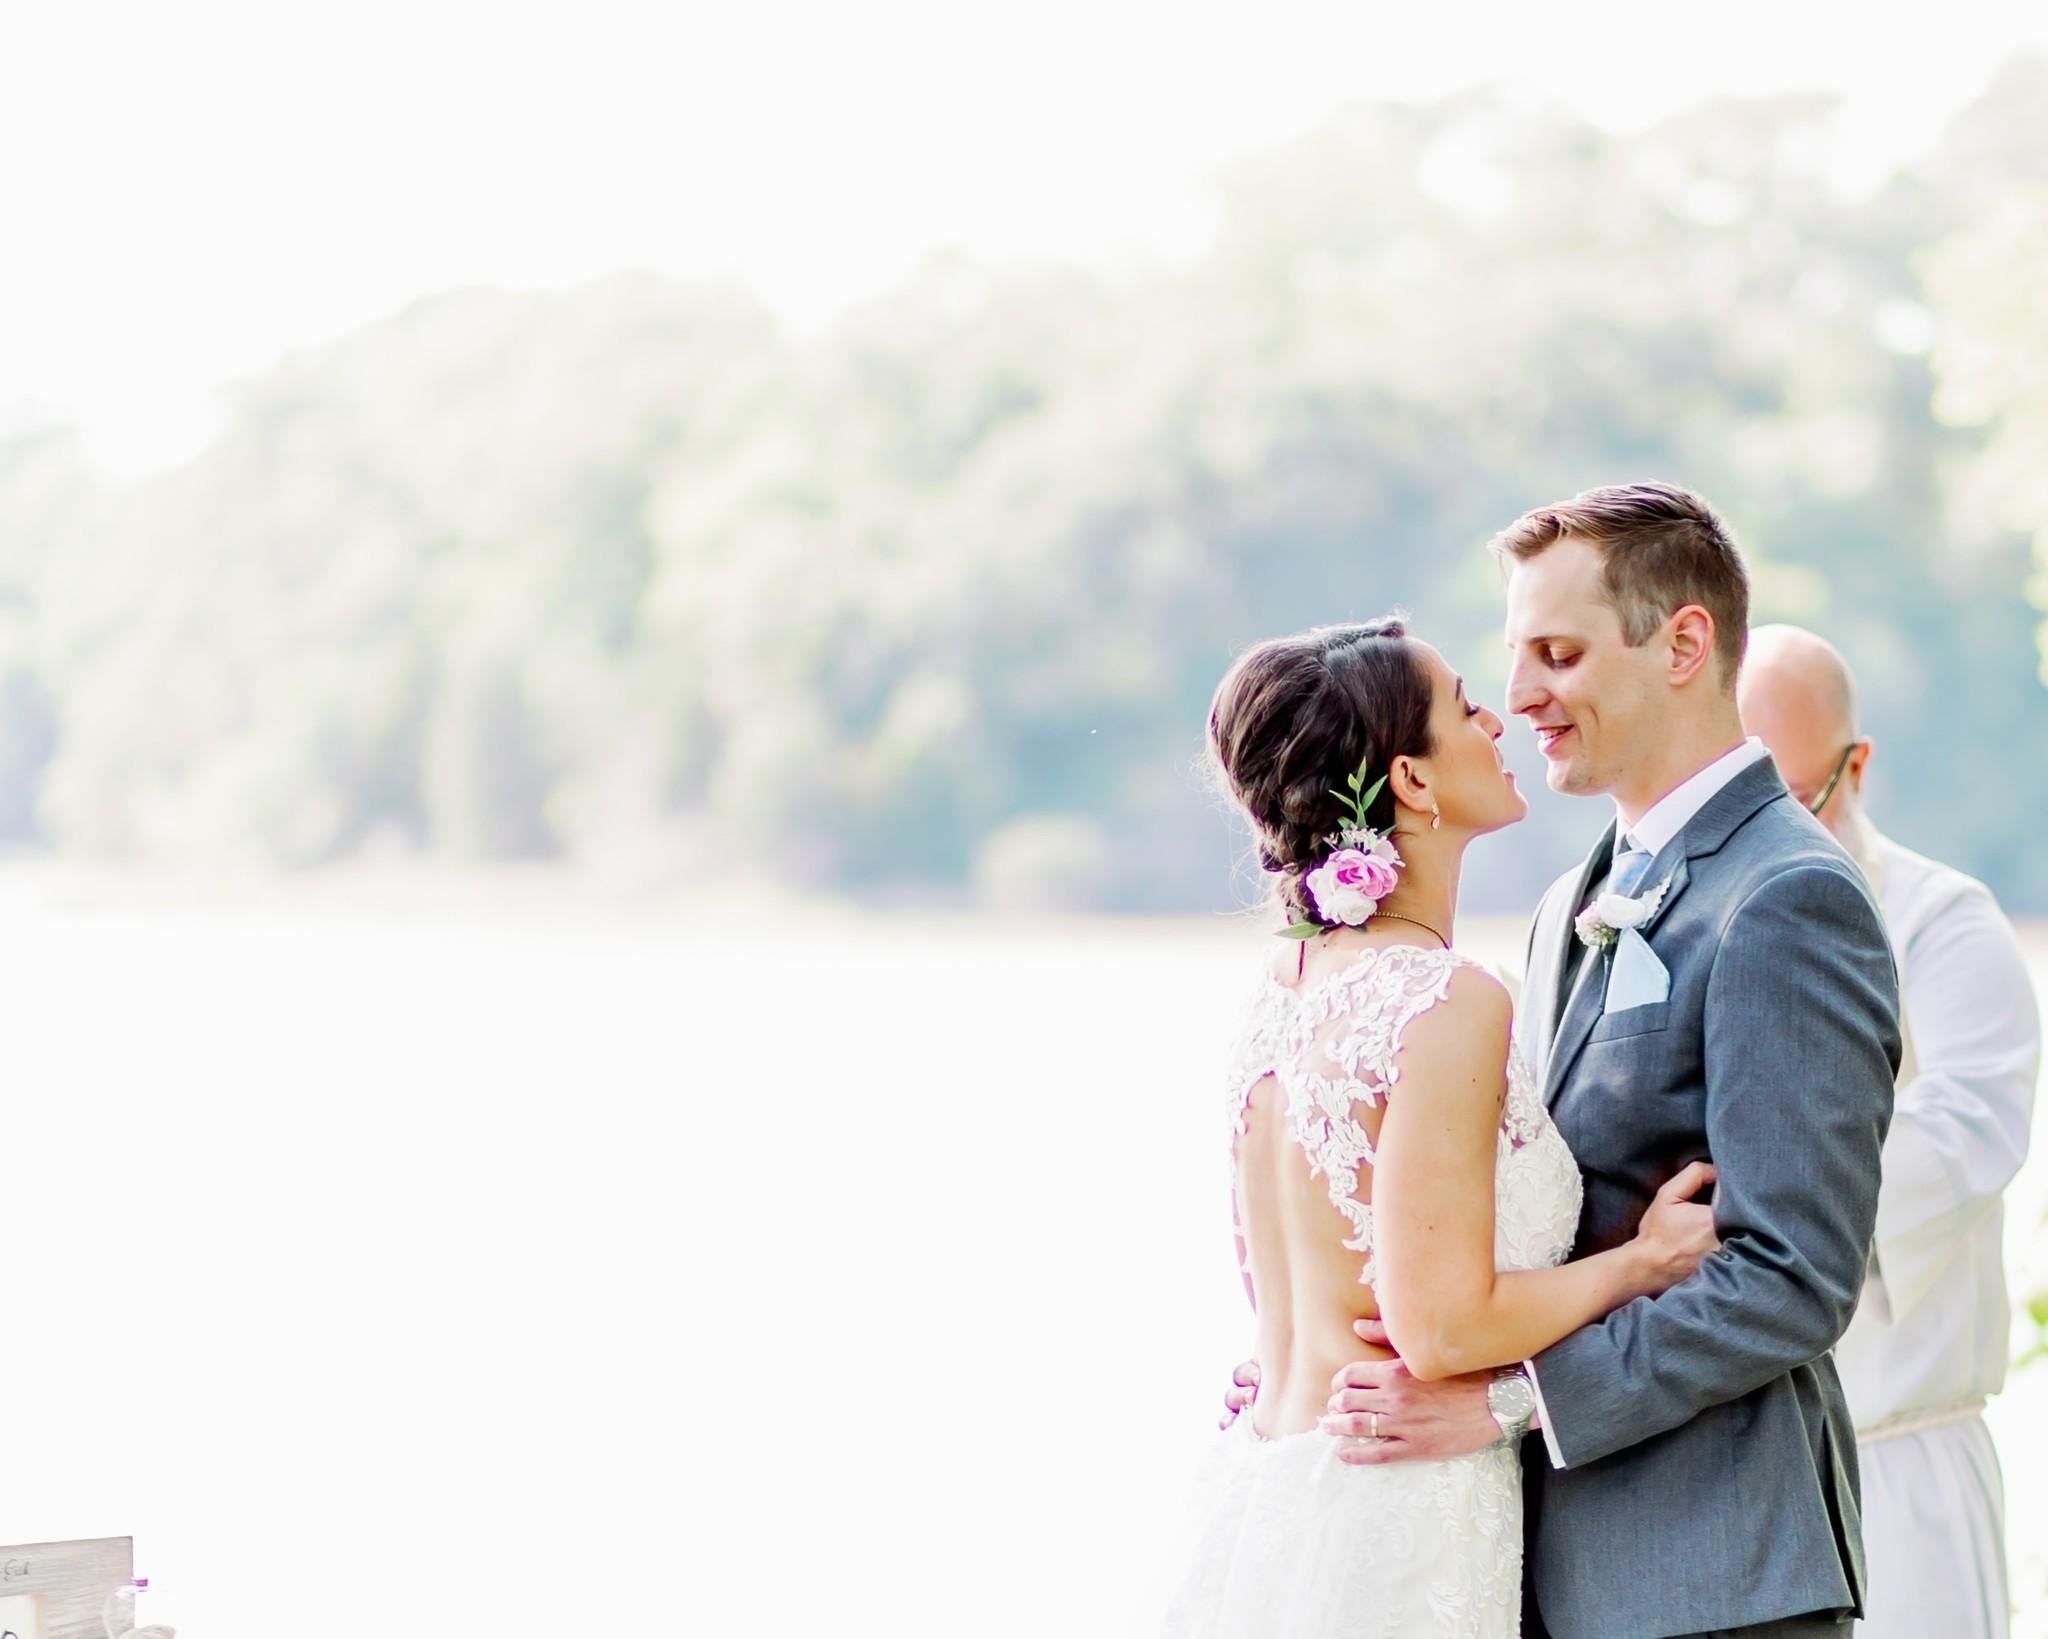 Cape-Charles- Wedding- Erik-Haven-2019 (240).jpg